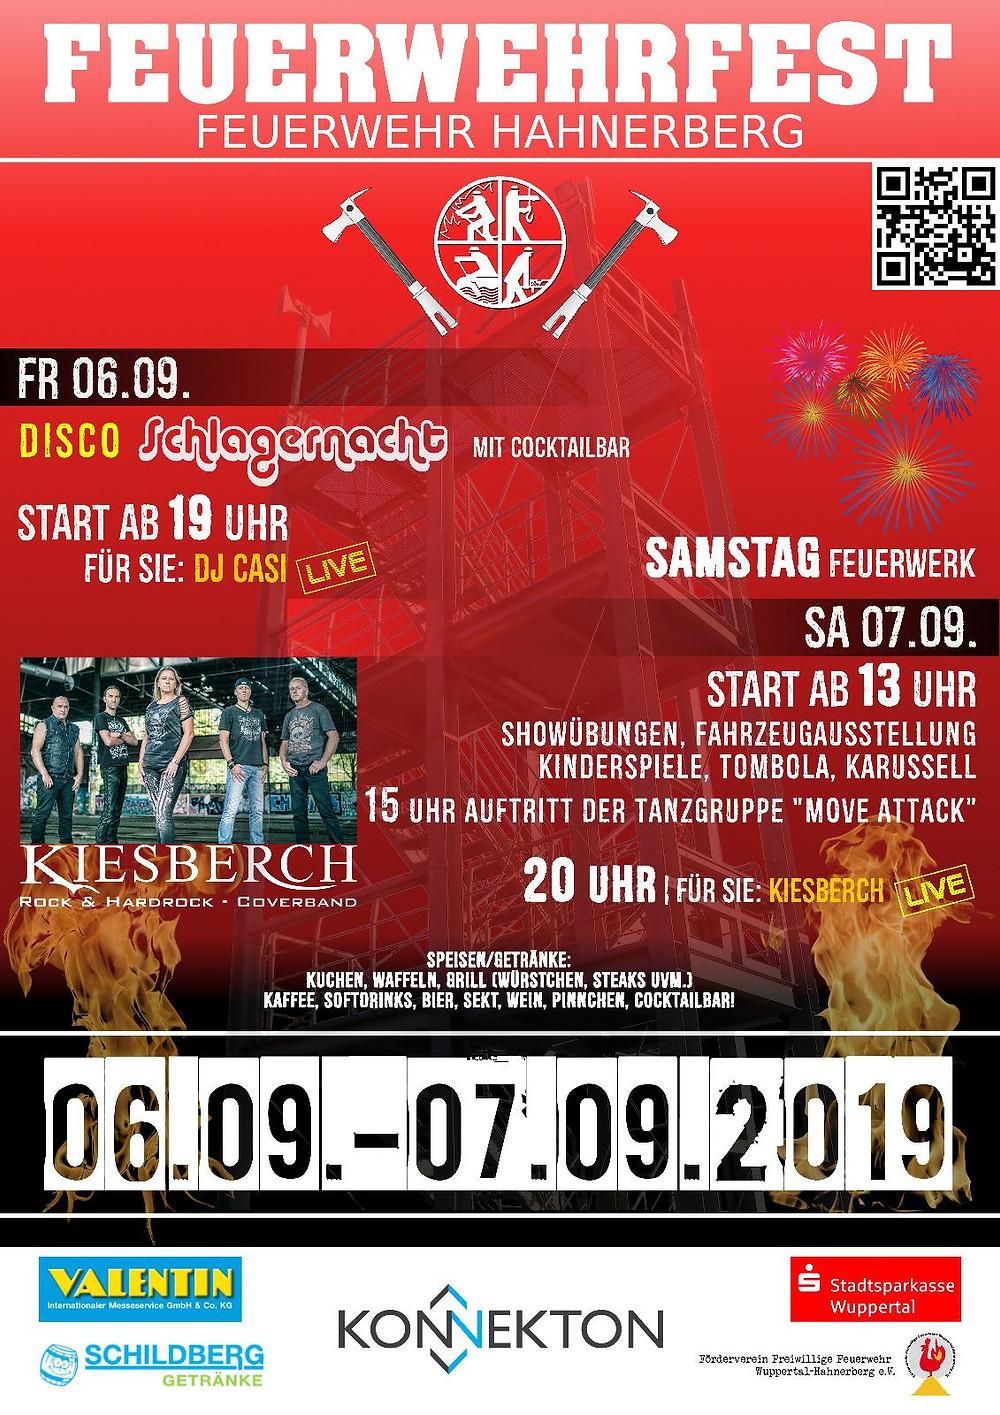 Feuerwehrfest 2019 | Feuerwehr Hahnerberg